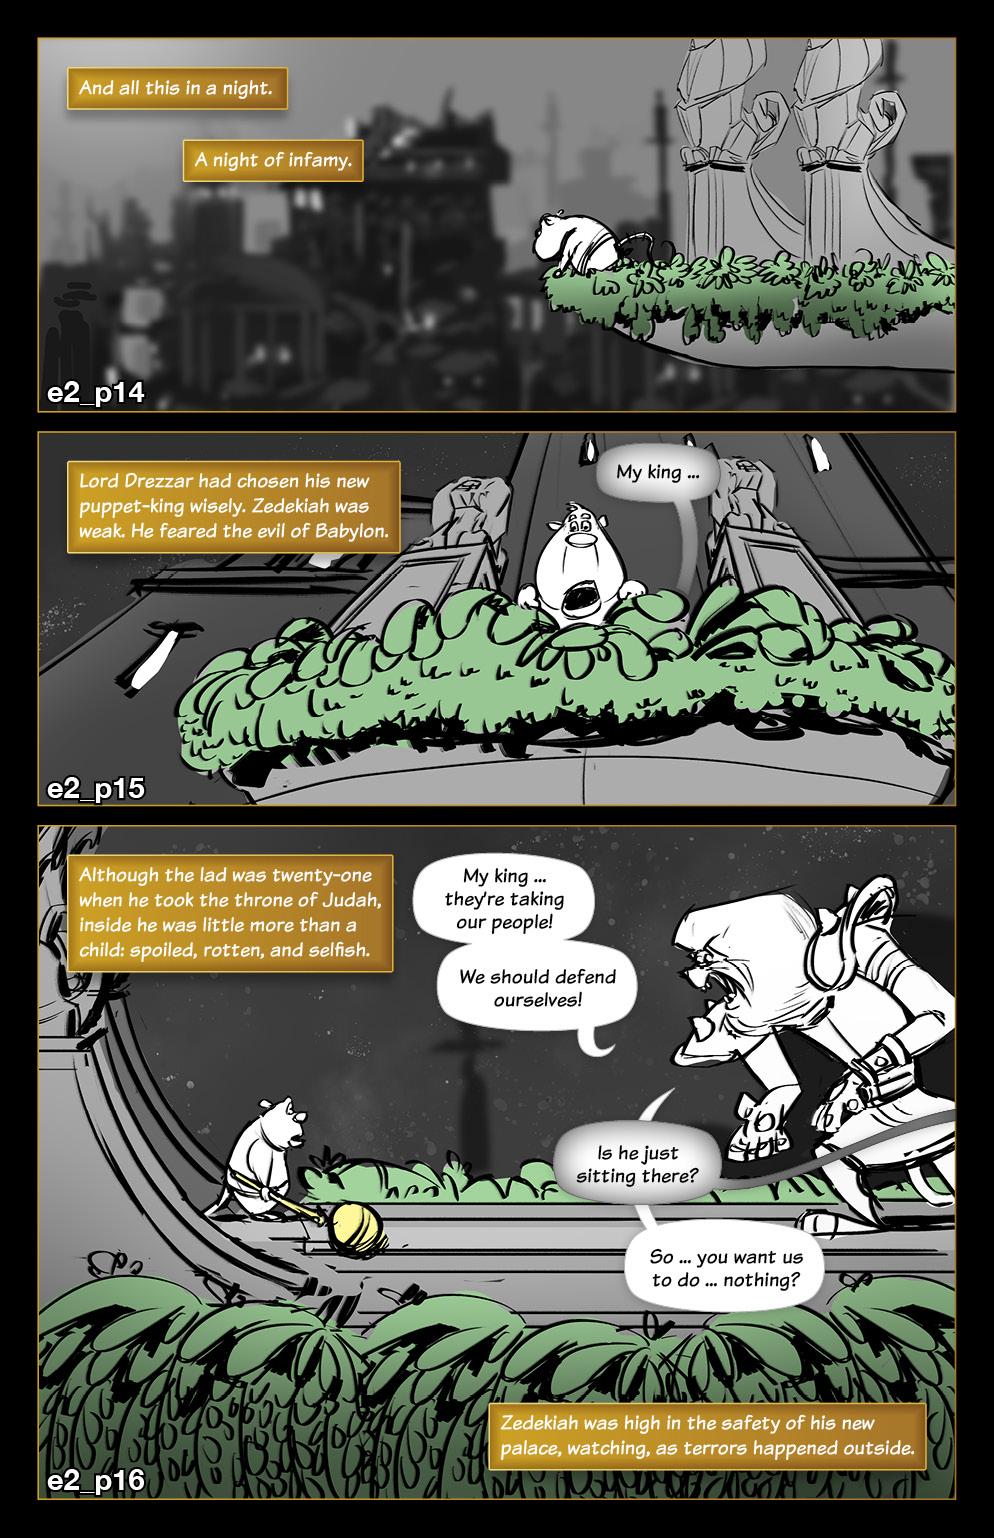 e2_storyboards_8.jpg